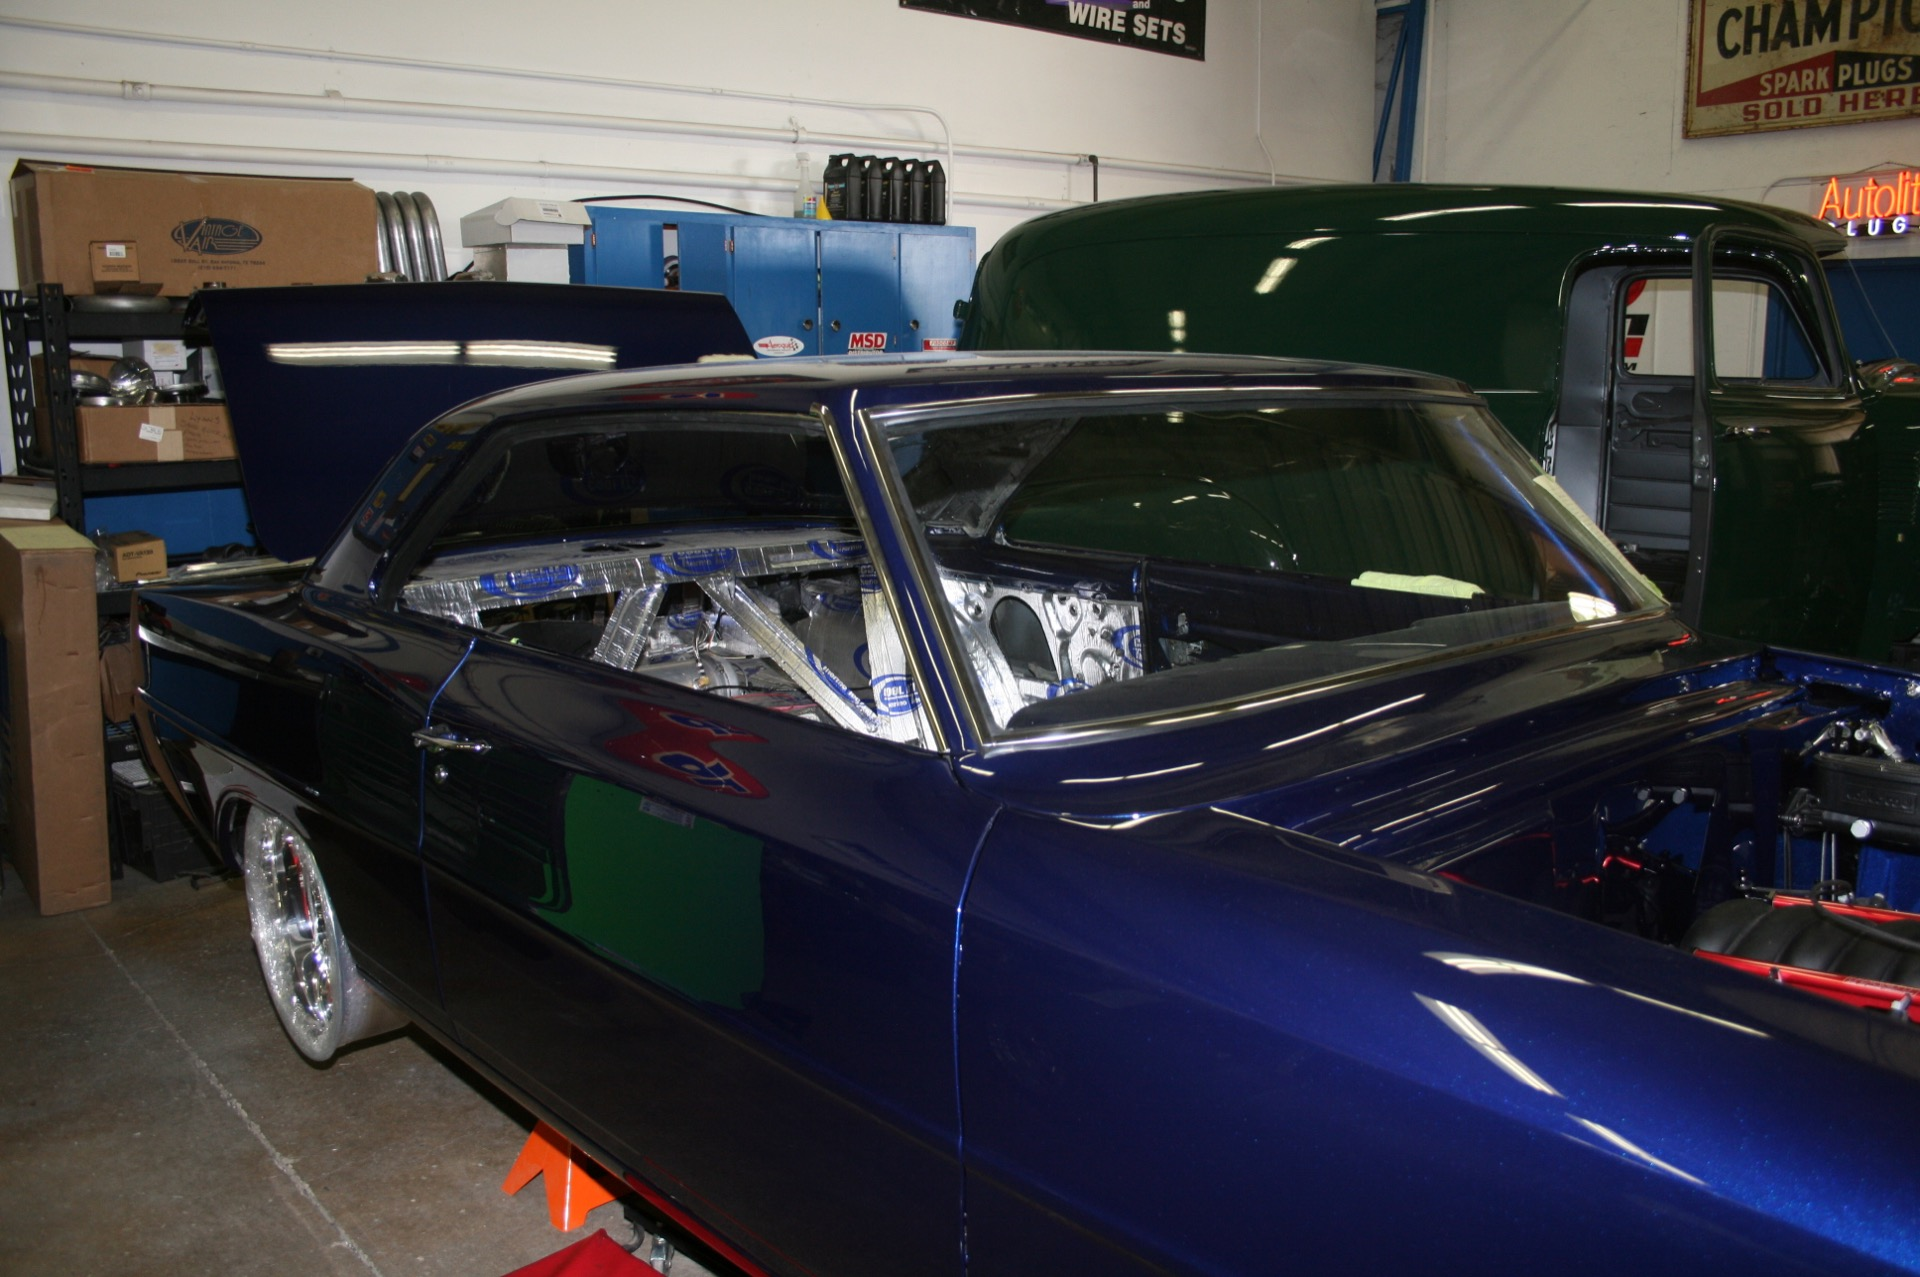 1966 Chevy Nova Metalworks Classics Auto Restoration Speed Shop Dome Light Wire Rear